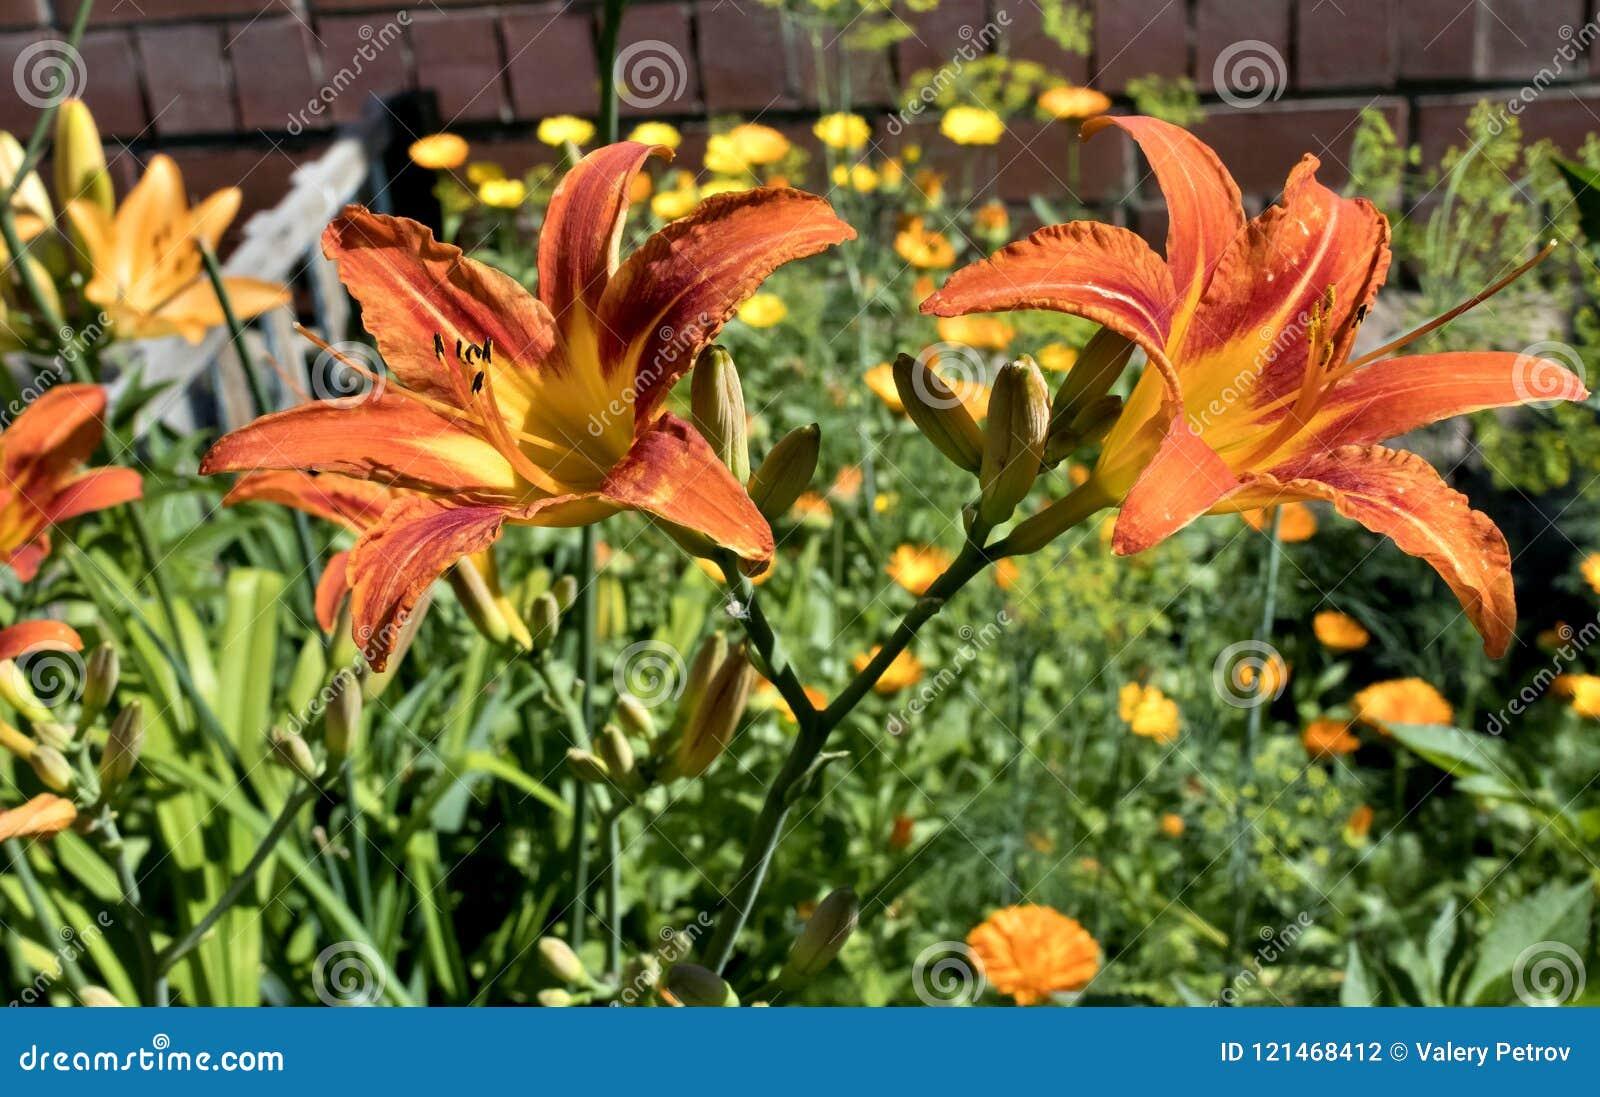 Orange tiger lily flower stock photo image of blooming 121468412 orange tiger lily flower izmirmasajfo